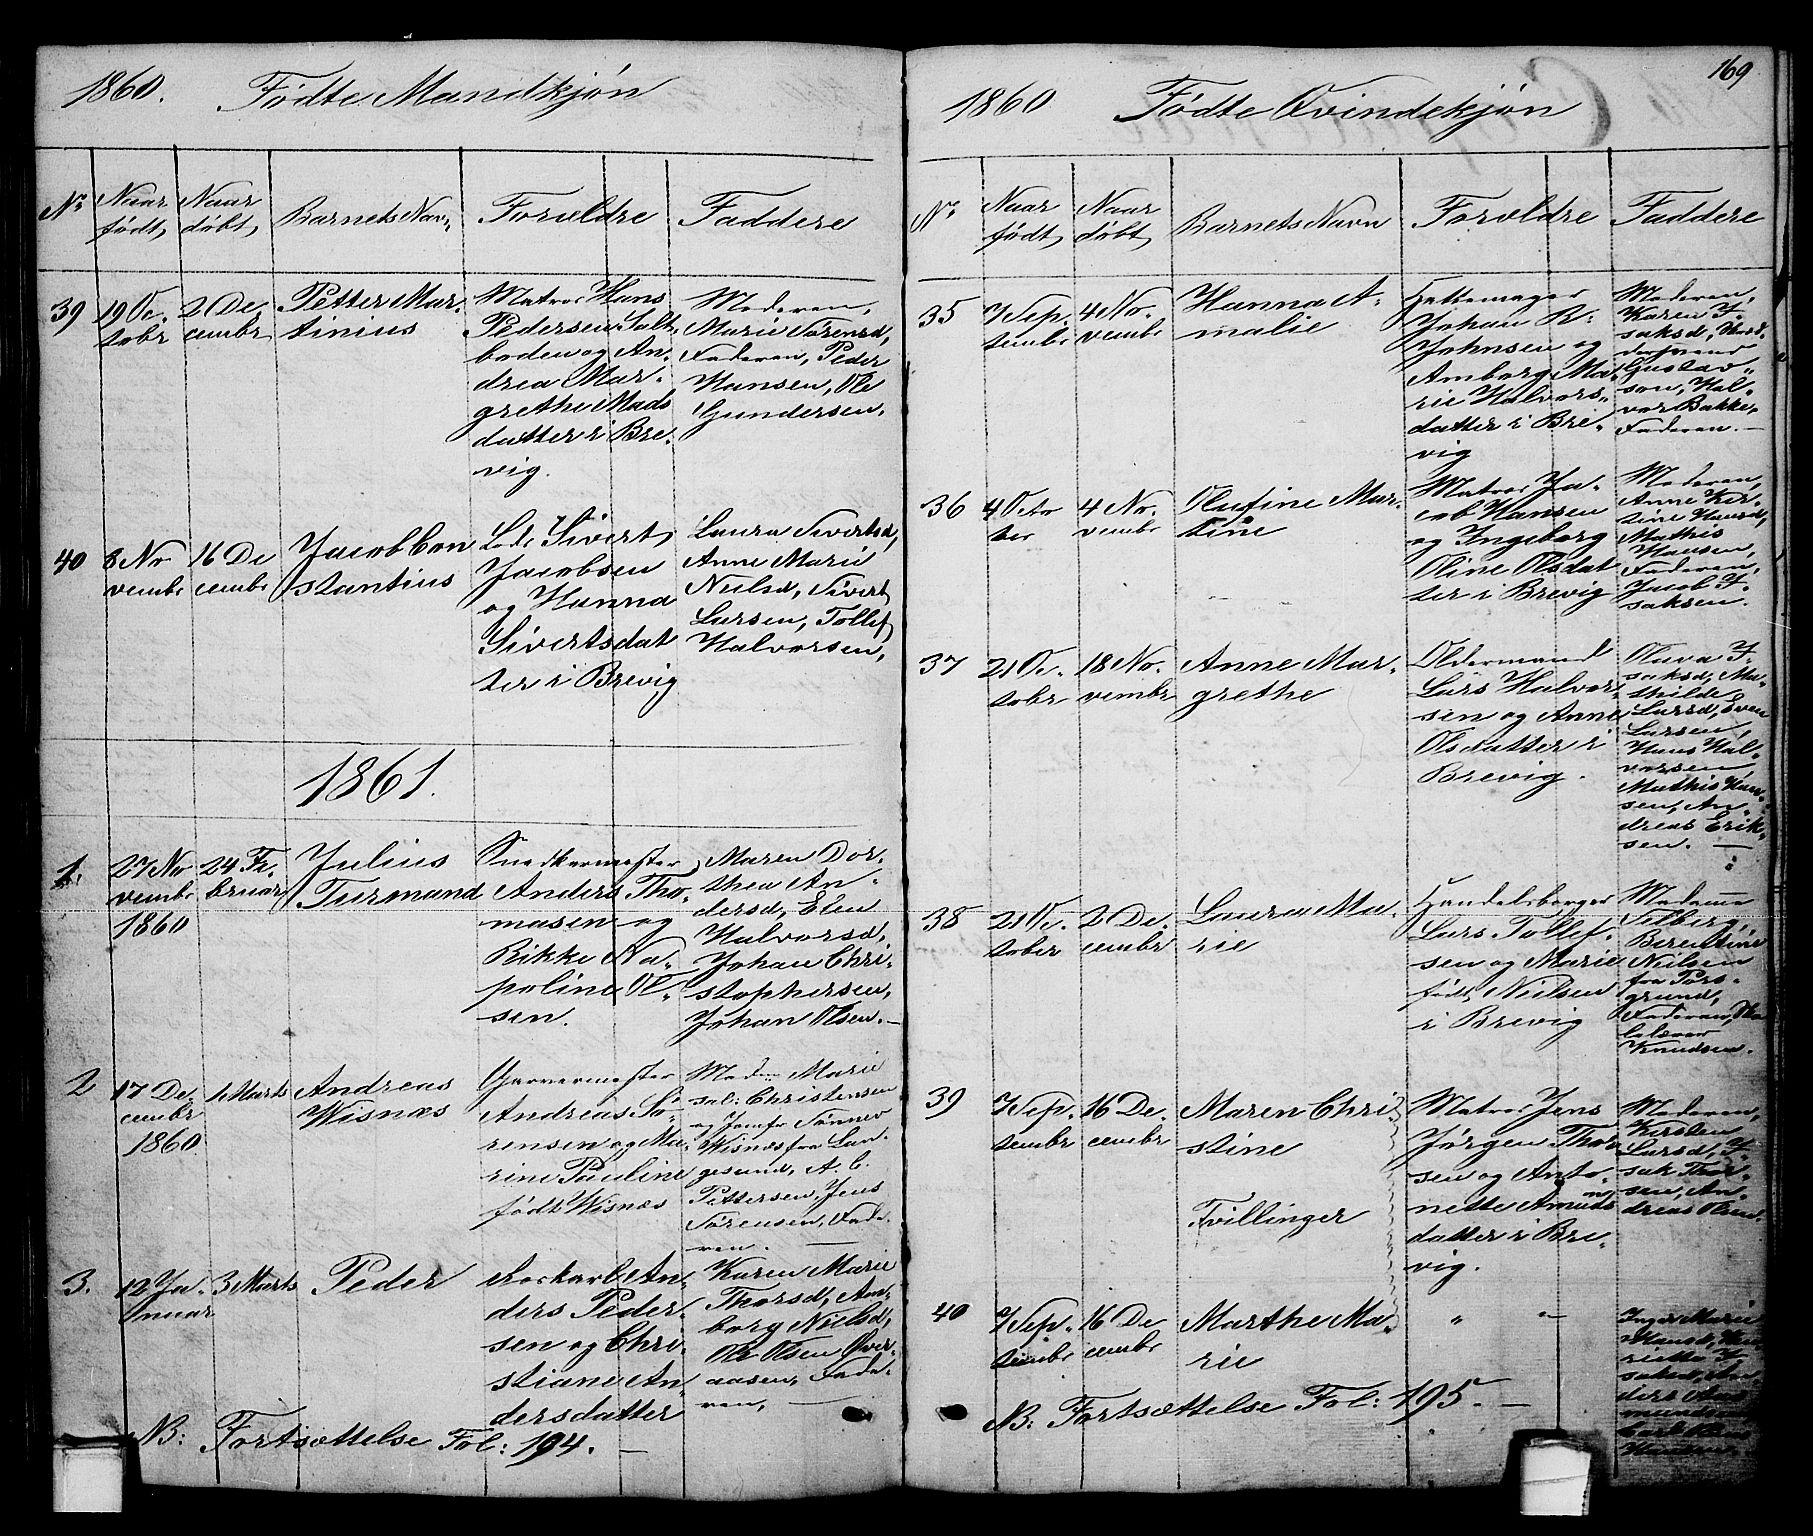 SAKO, Brevik kirkebøker, G/Ga/L0002: Klokkerbok nr. 2, 1846-1865, s. 169